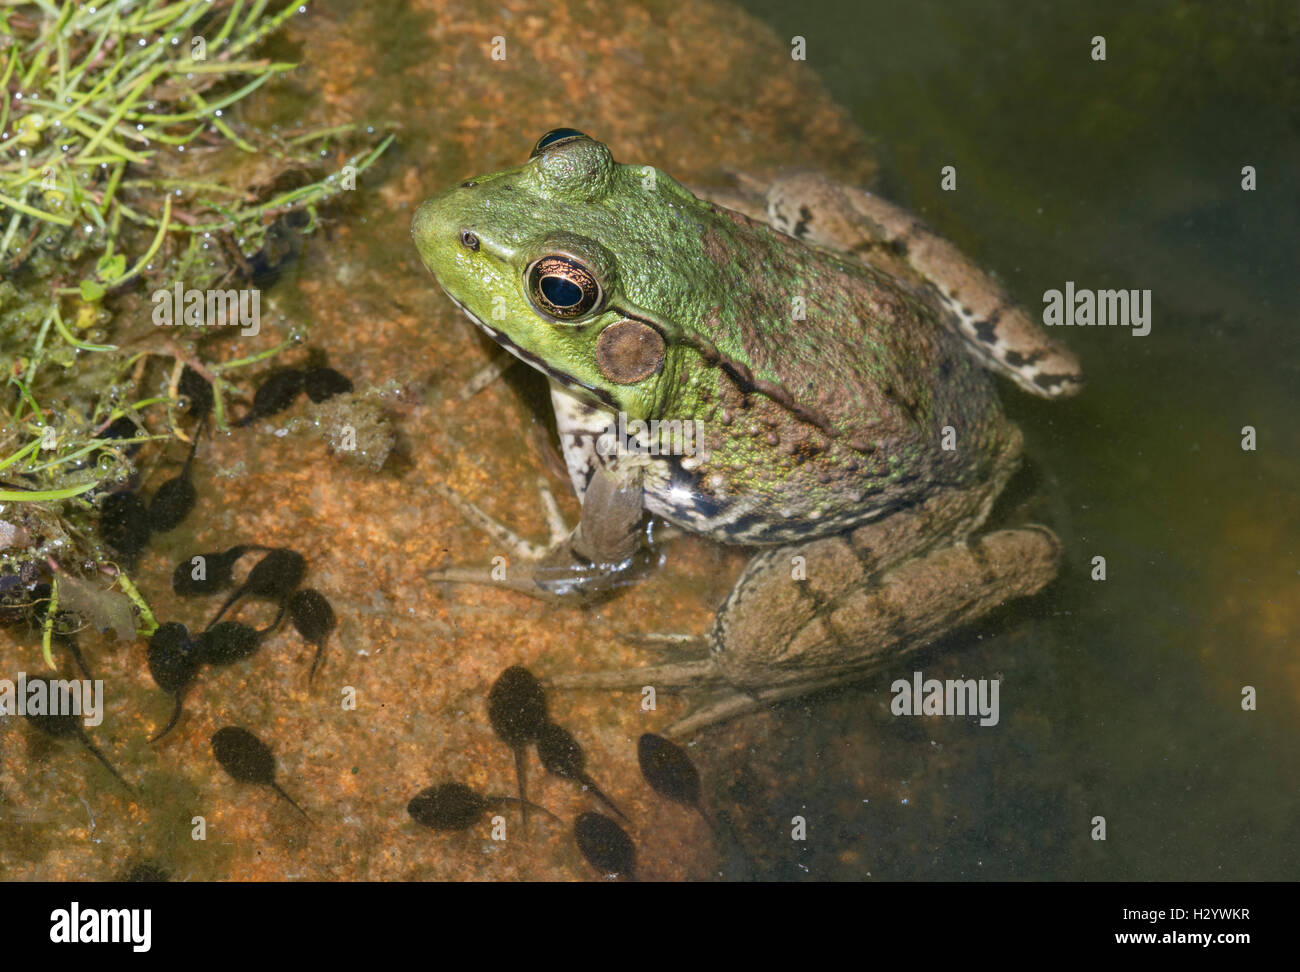 Rana Verde (Rana clamitans), estanque, E USA por Skip Moody / Dembinsky Foto Associates Foto de stock